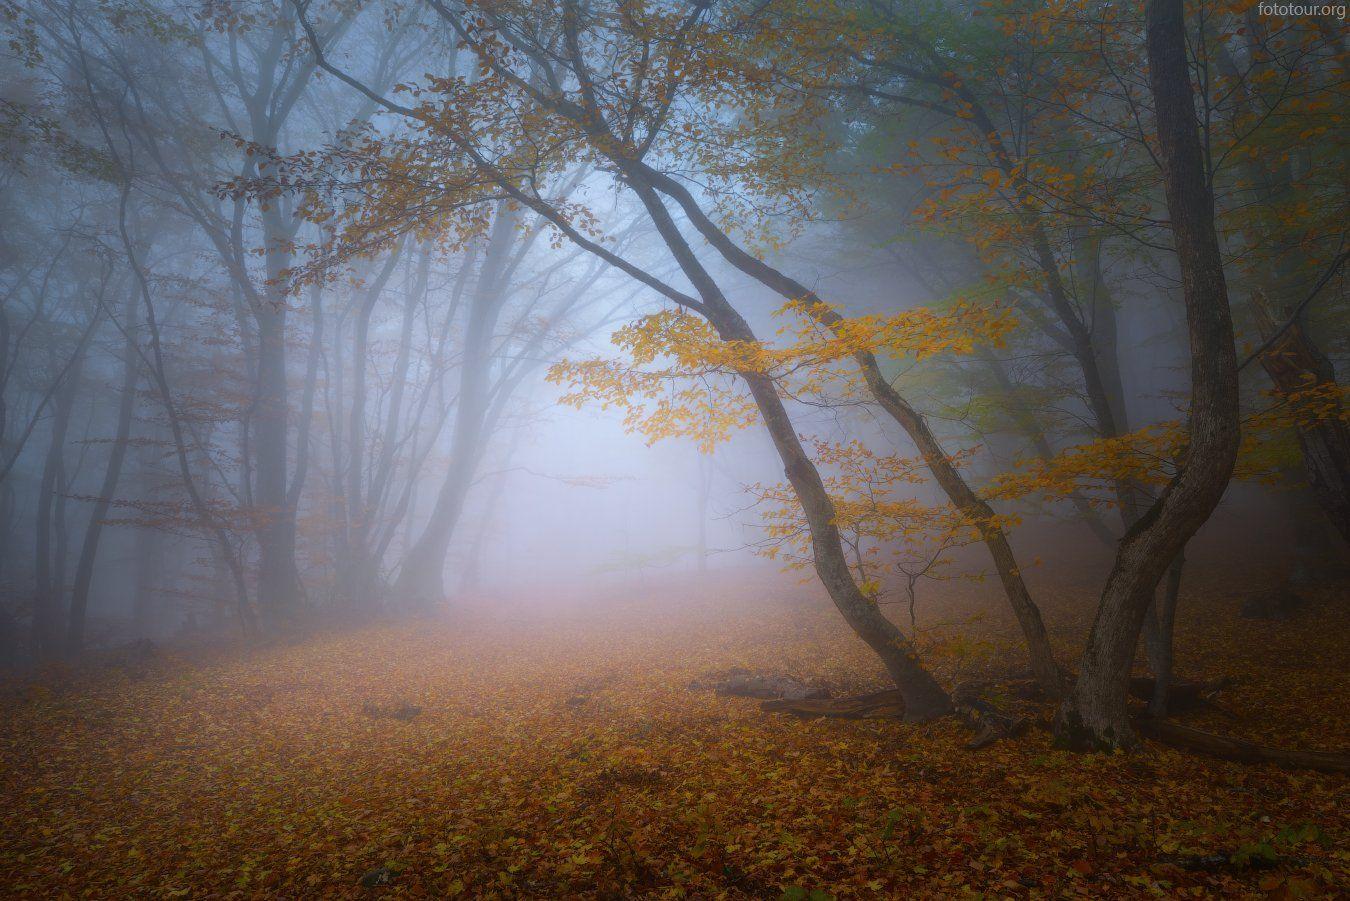 крым, лес, туман, Анатолий Гордиенко (fototour.org)